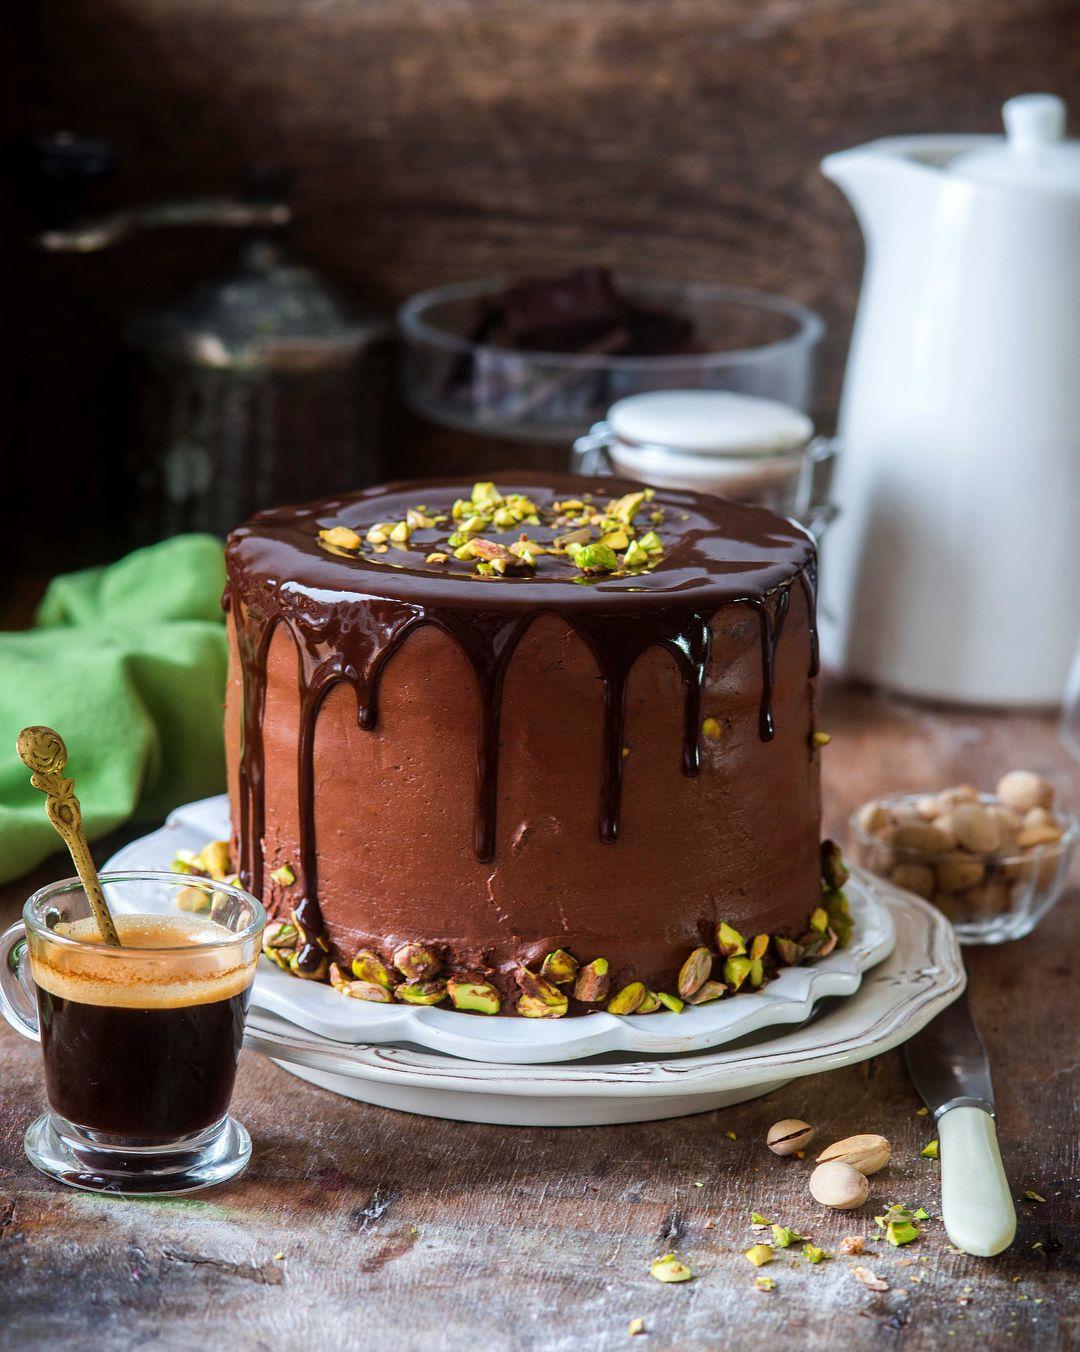 Шоколадно-фисташковый торт | Пироги,торты, тарты, кексы ...